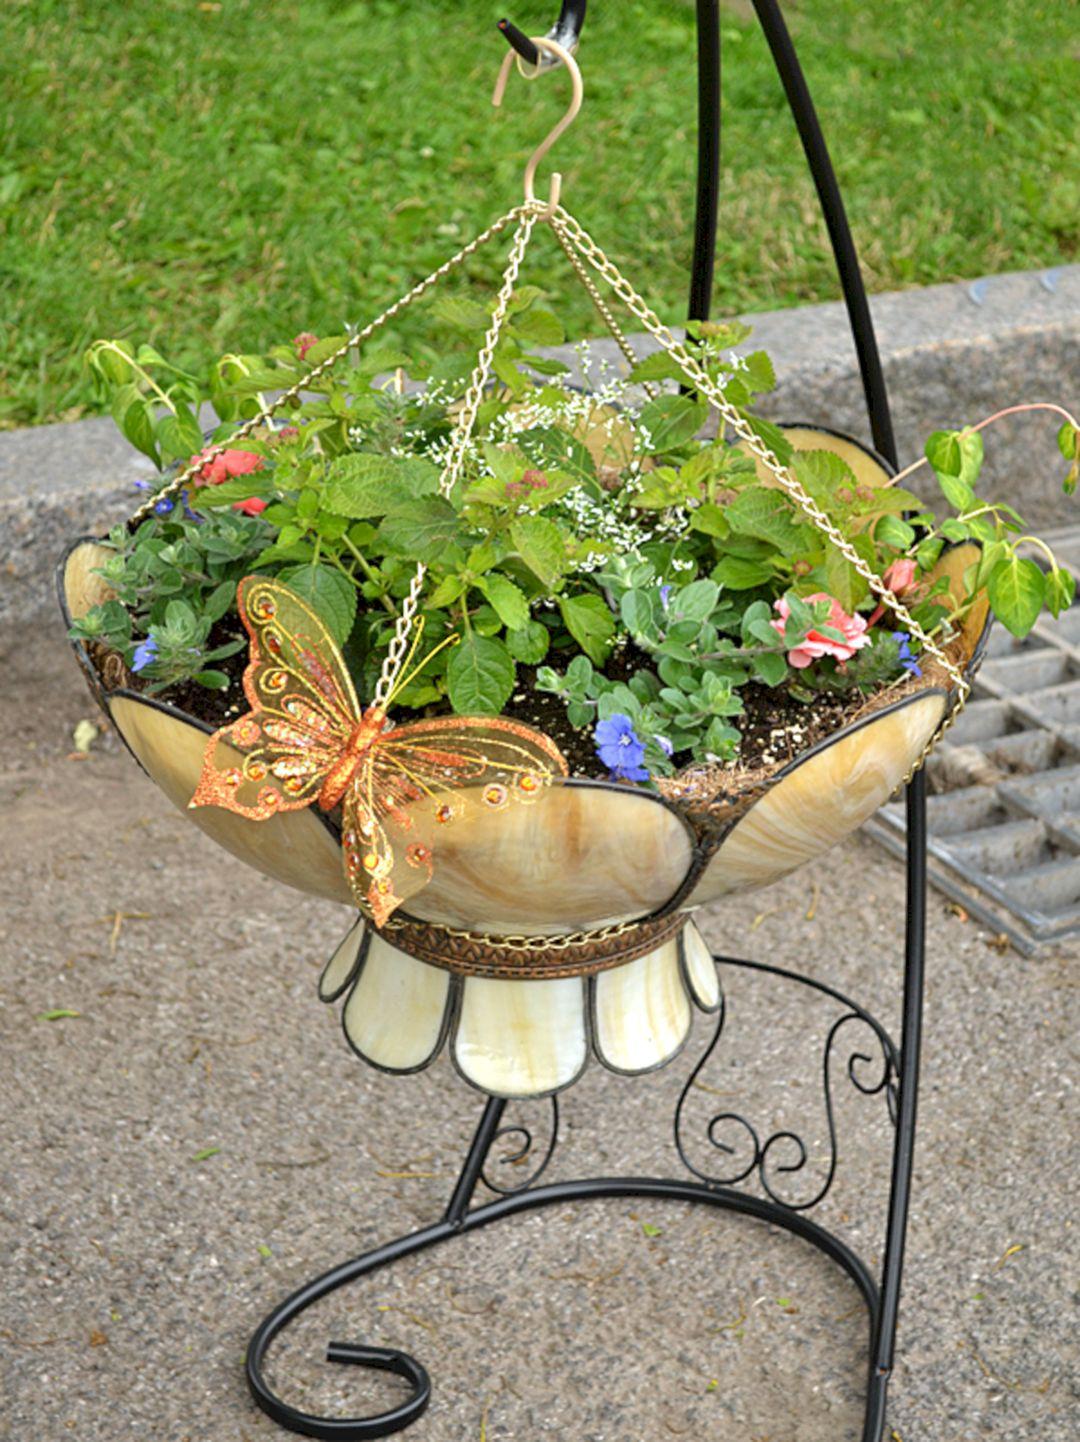 Plants that grow upside down 8 freshouz - Can a plant grow upside down ...